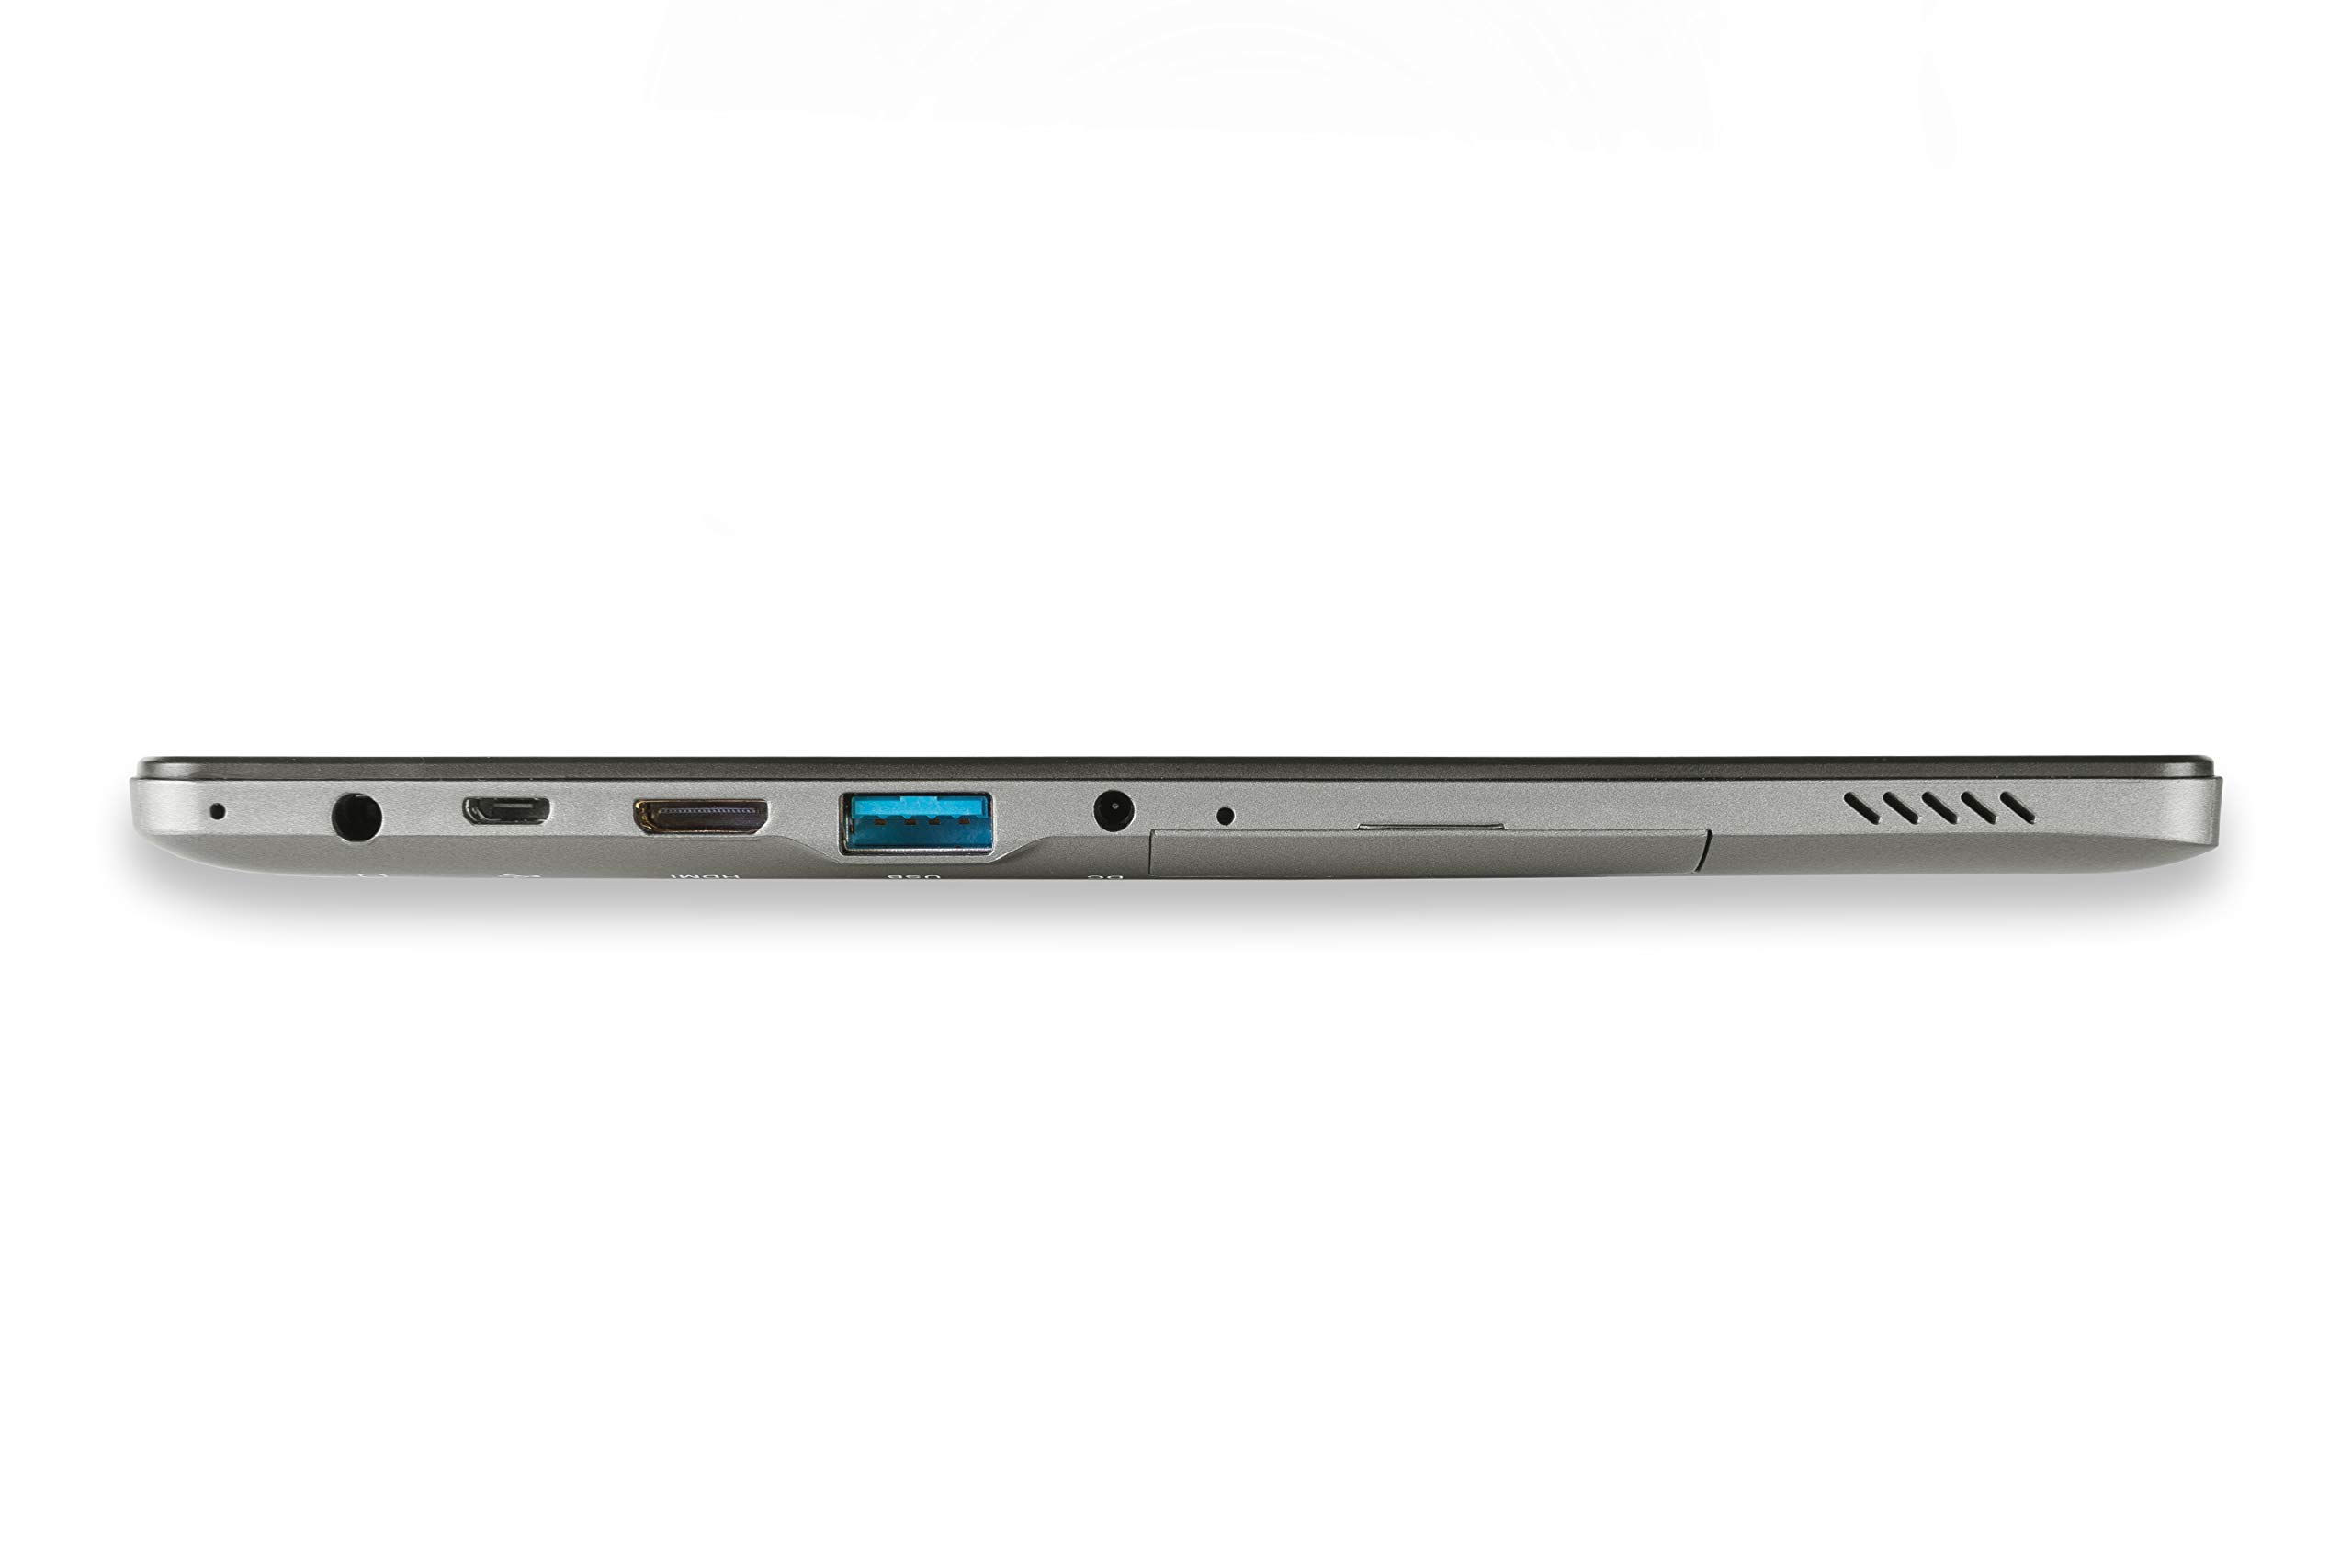 10-Windows-10-Fusion5-Ultra-Slim-Windows-Tablet-PC-4GB-RAM-USB-30-Intel-5MP-and-2MP-Cameras-Windows-10-S-Tablet-PC